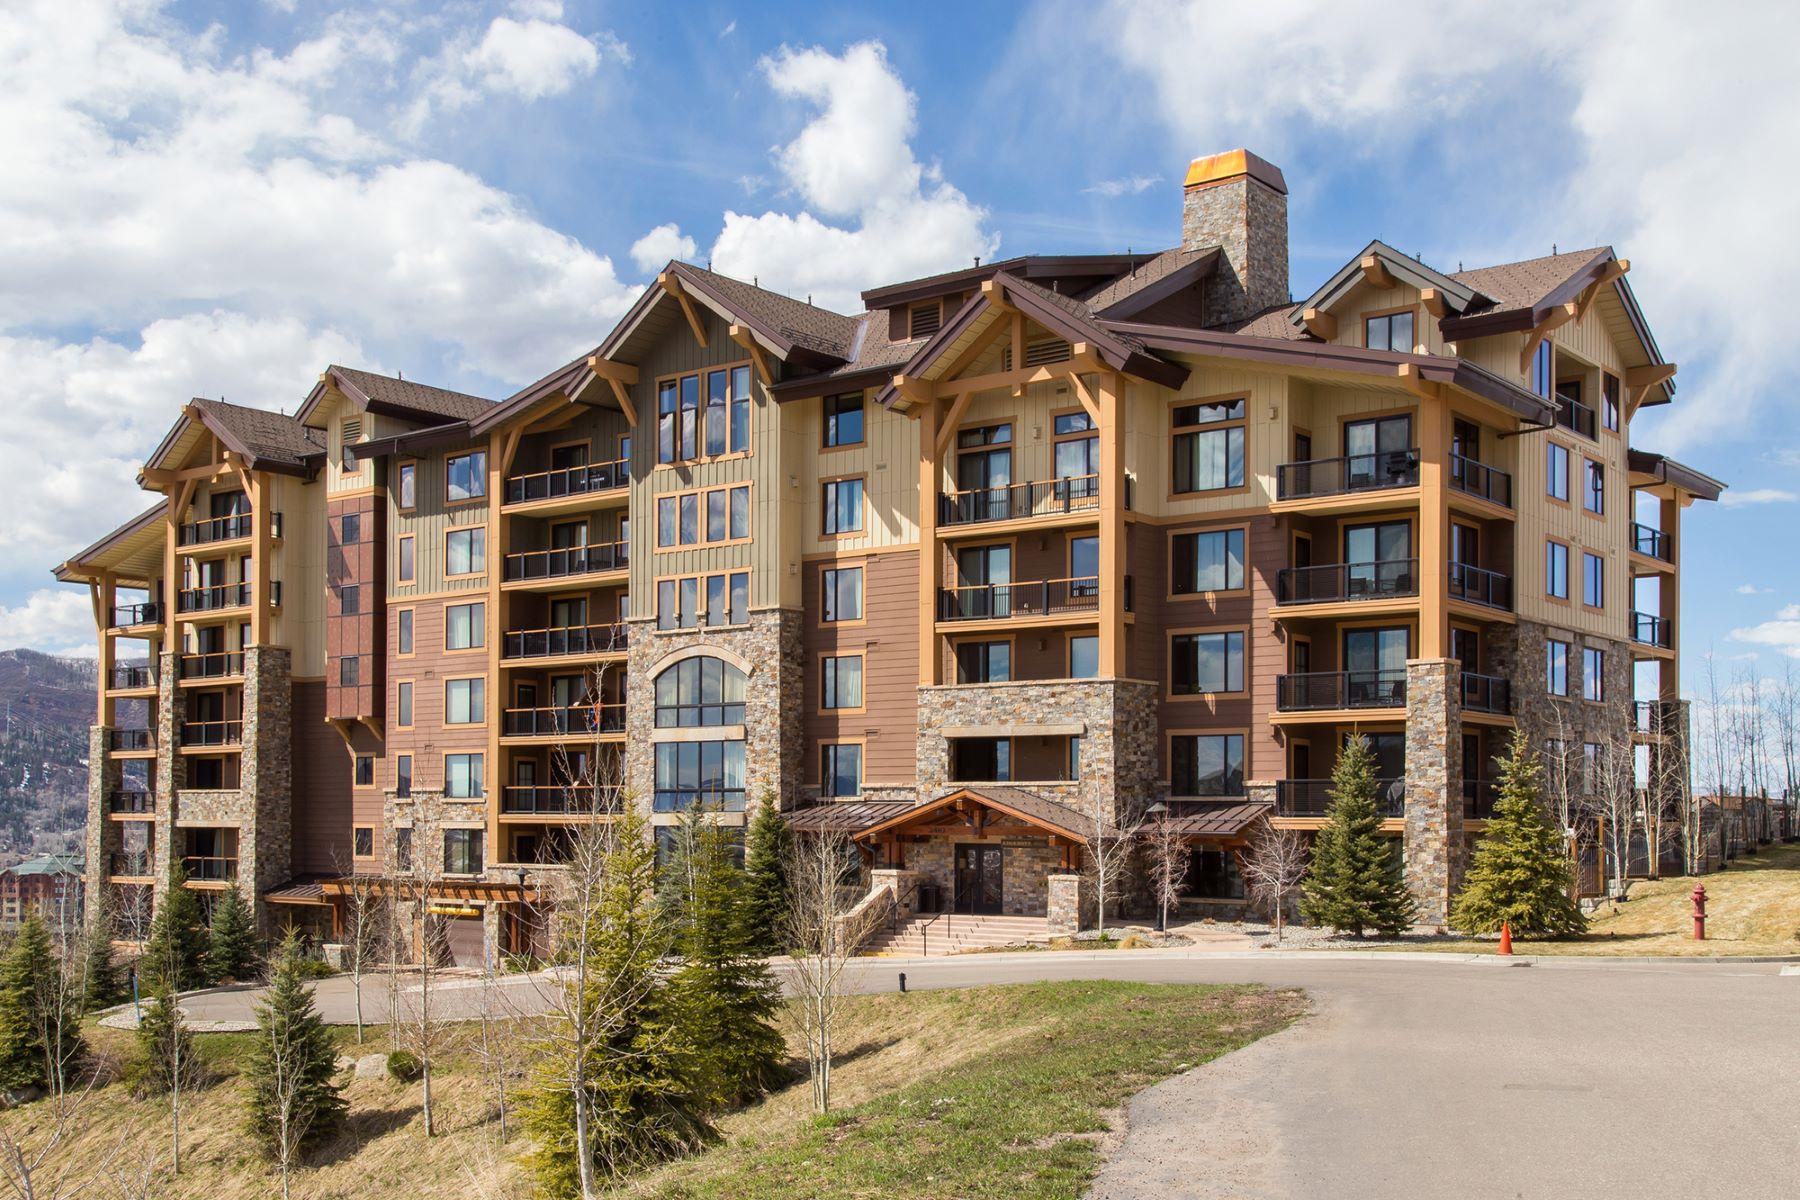 Condominium for Sale at Ski-in/Ski-out Edgemont 2410 Ski Trail Lane, #2506 Steamboat Springs, Colorado 80487 United States